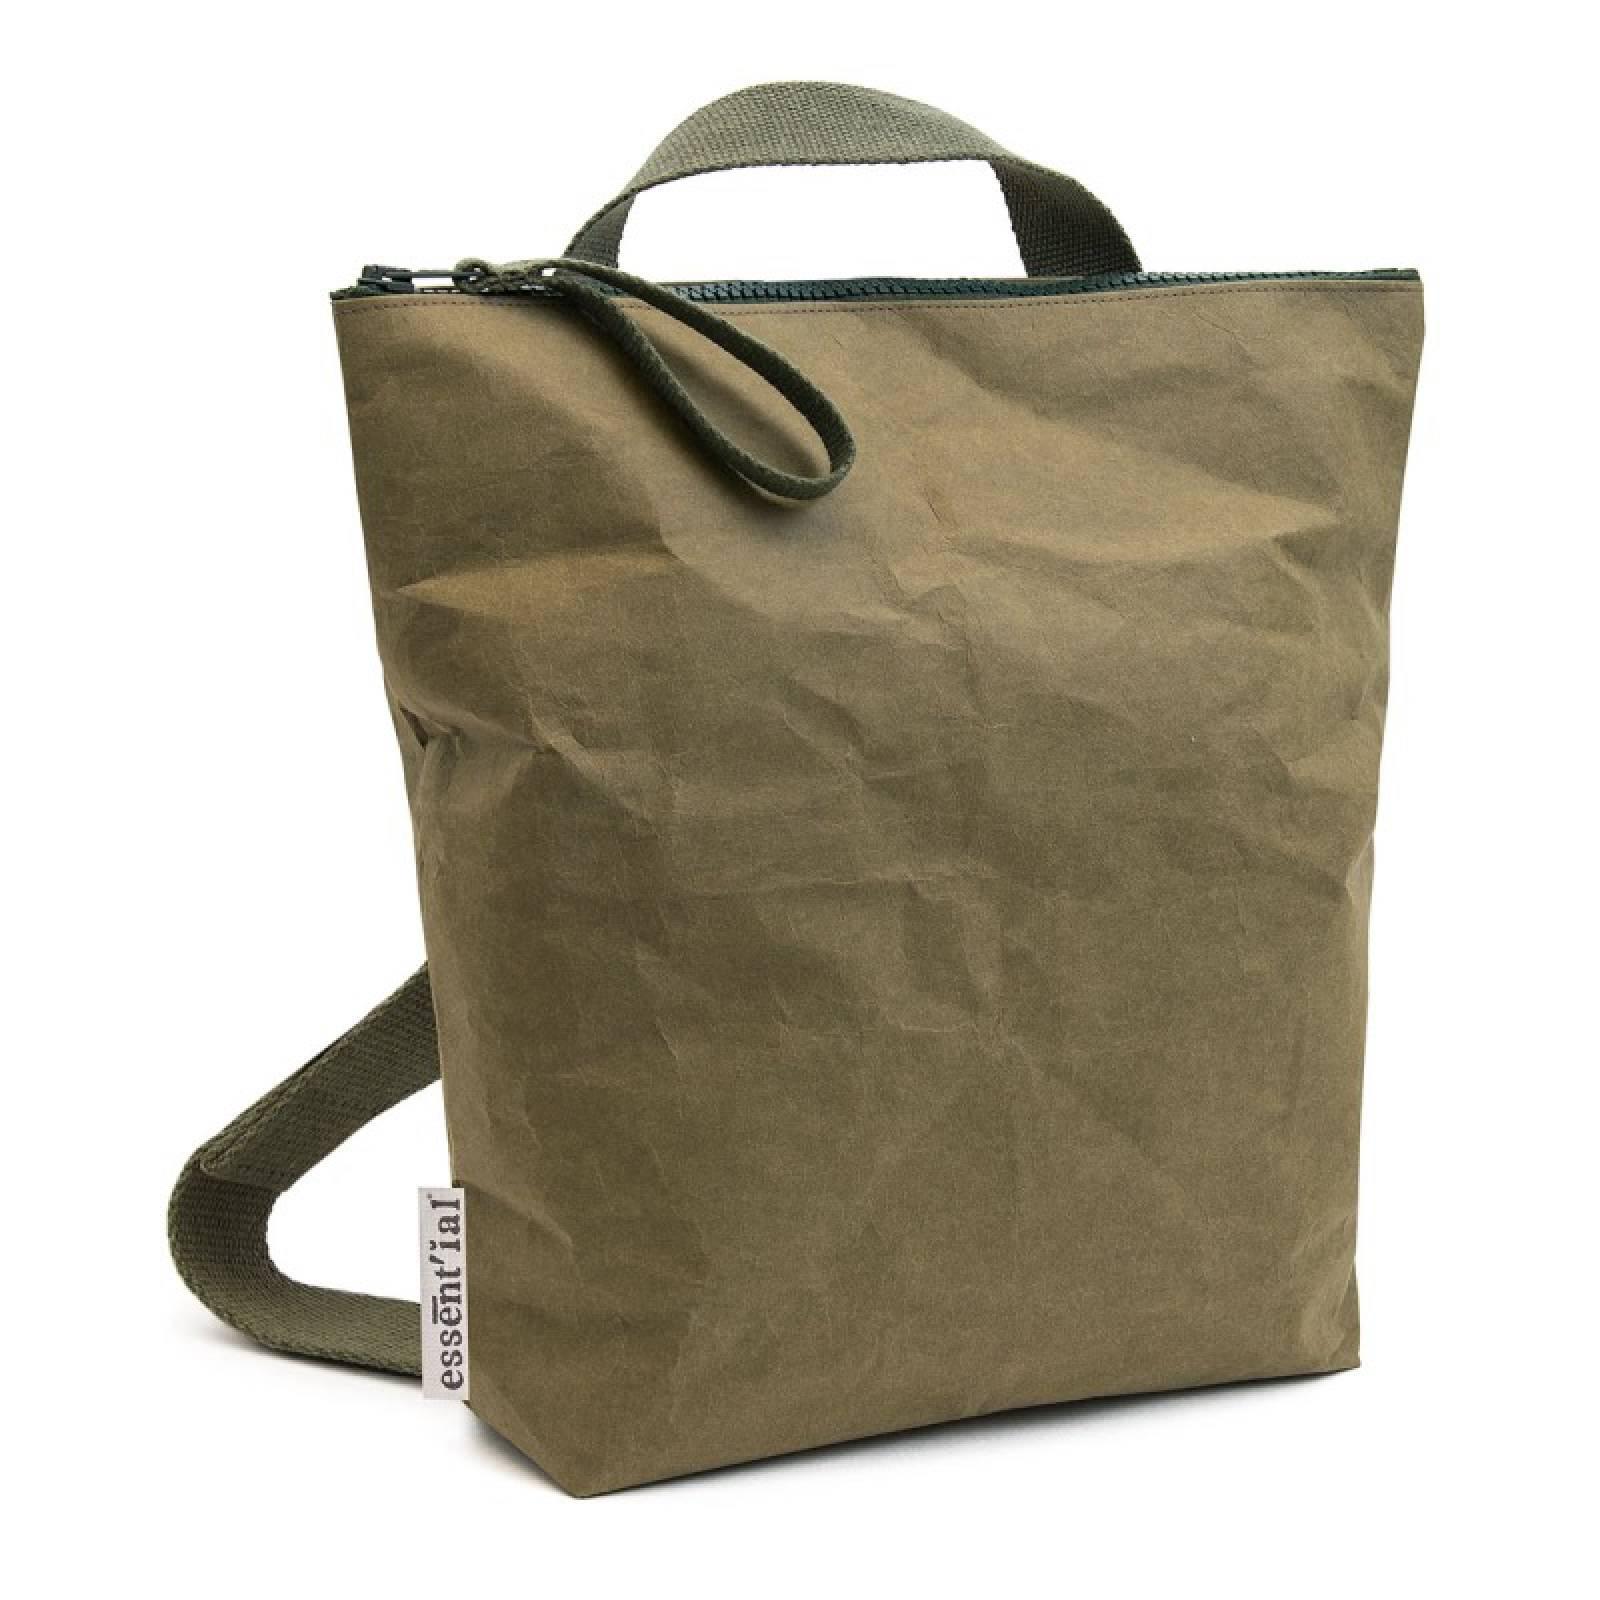 XL Paper Backpack With Zip Top Closure In Dark Green